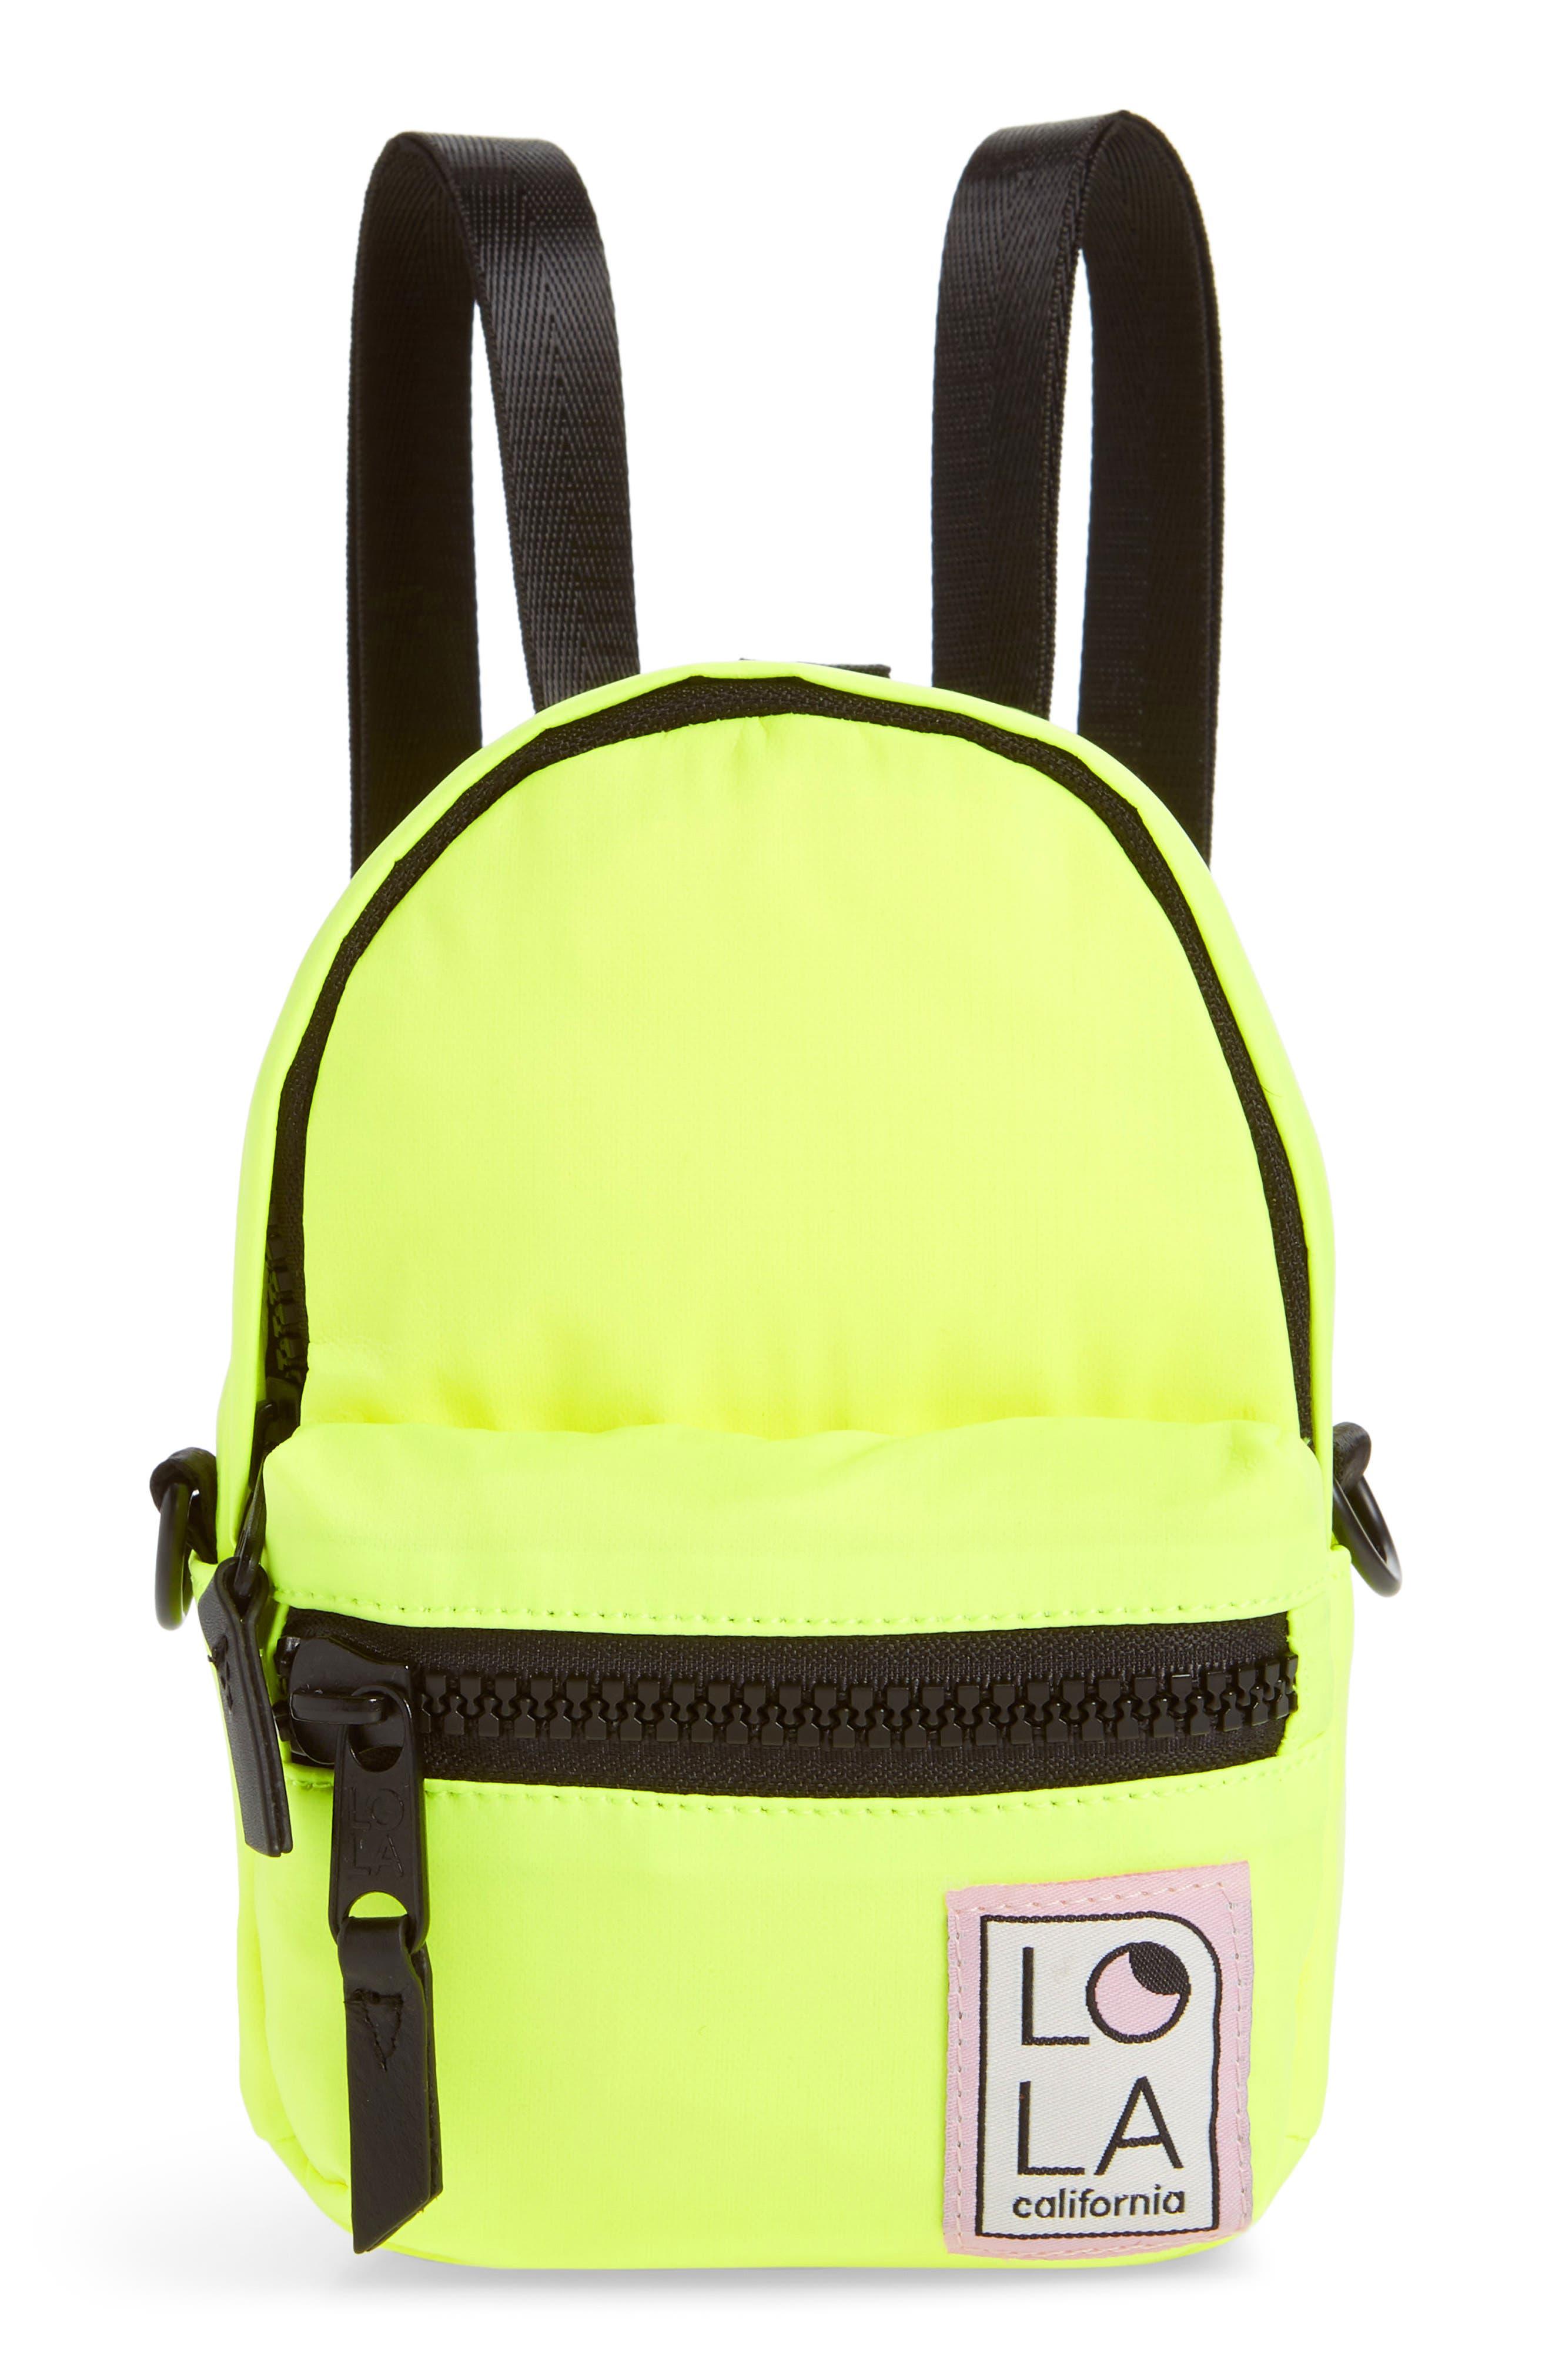 Lola Los Angeles Stargazer Mini Convertible Backpack - Yellow